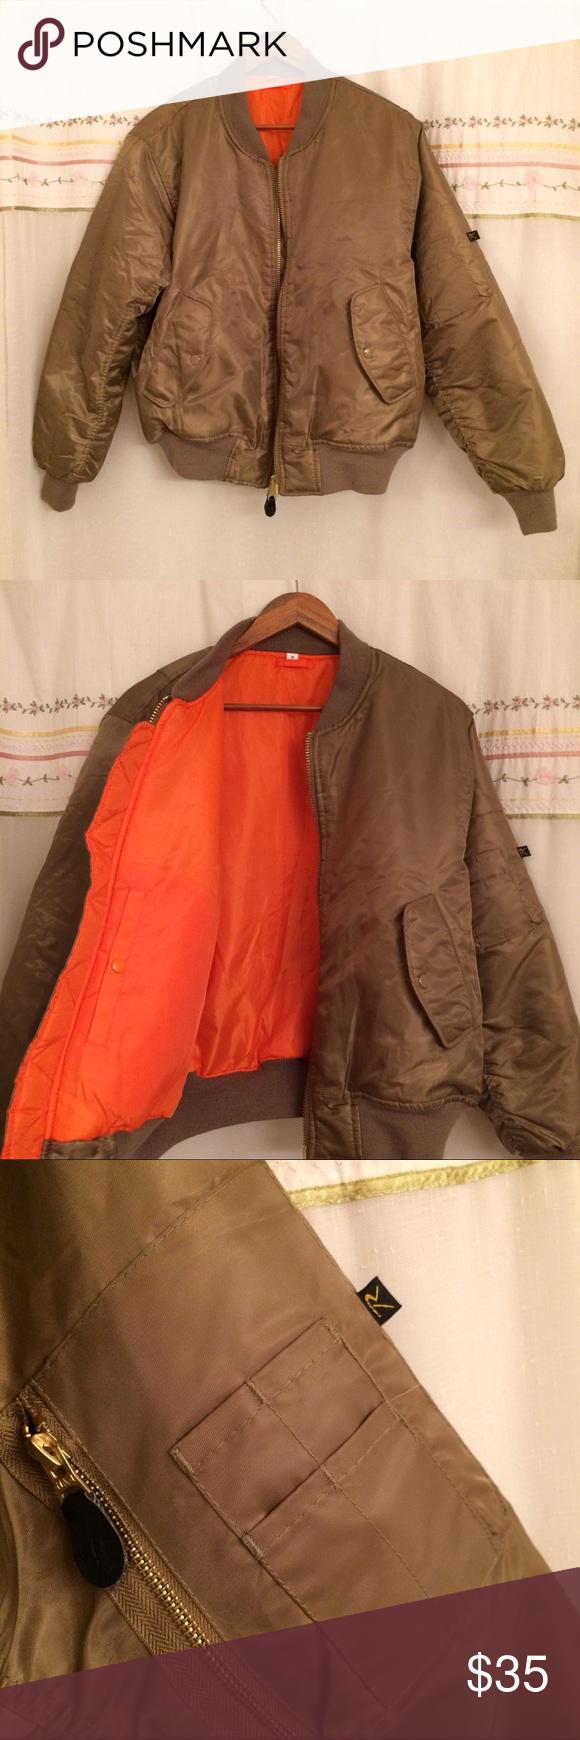 Sold Nwot Rothco Ma 1 Reversible Flight Jacket Flight Jacket Rothco Jackets [ 1740 x 580 Pixel ]